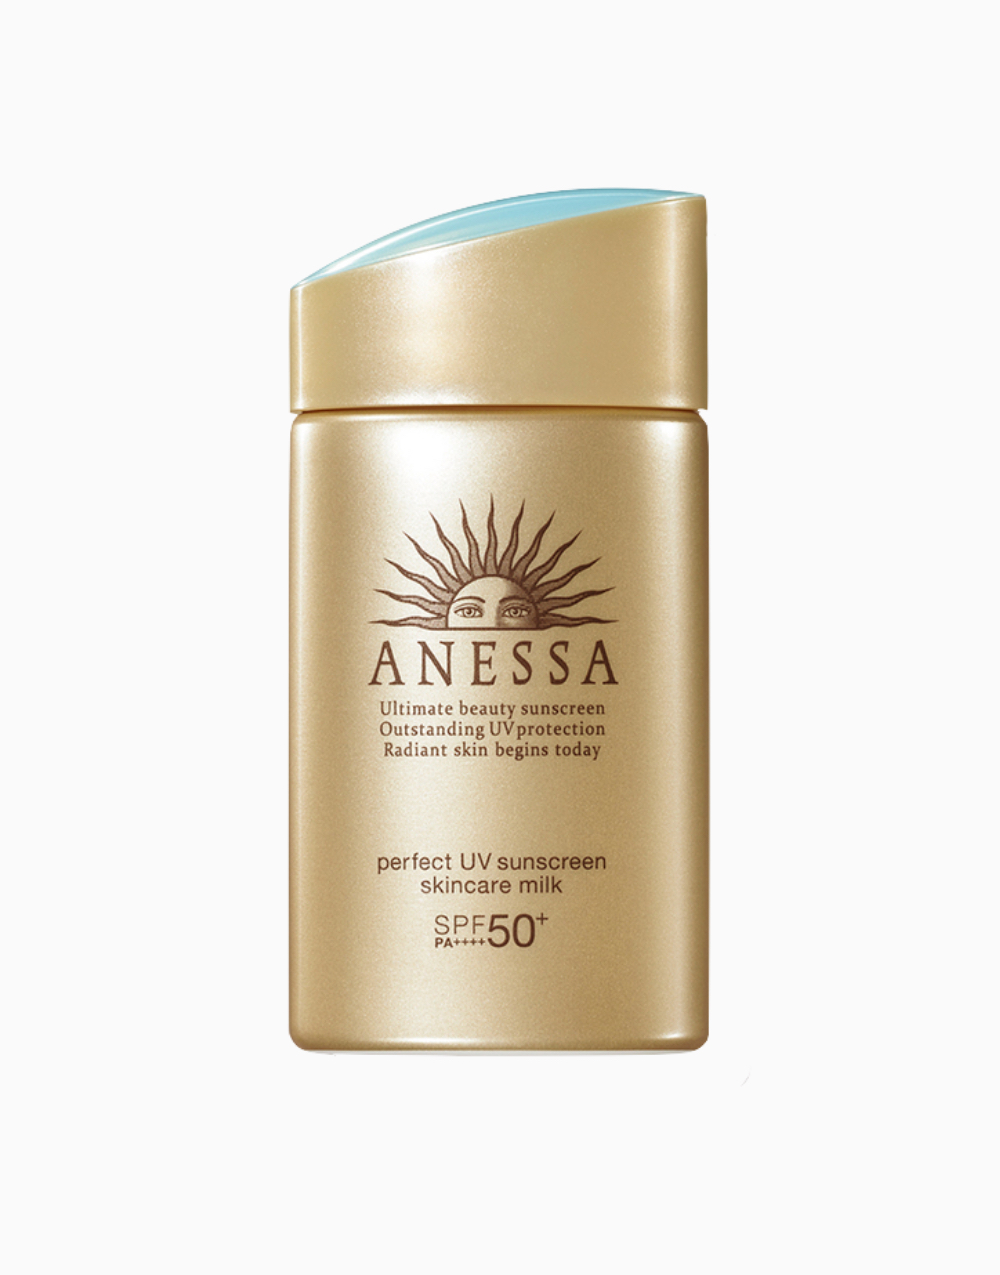 Perfect UV Sunscreen Skincare Milk SPF 50+ PA++++ (60ml) by Anessa